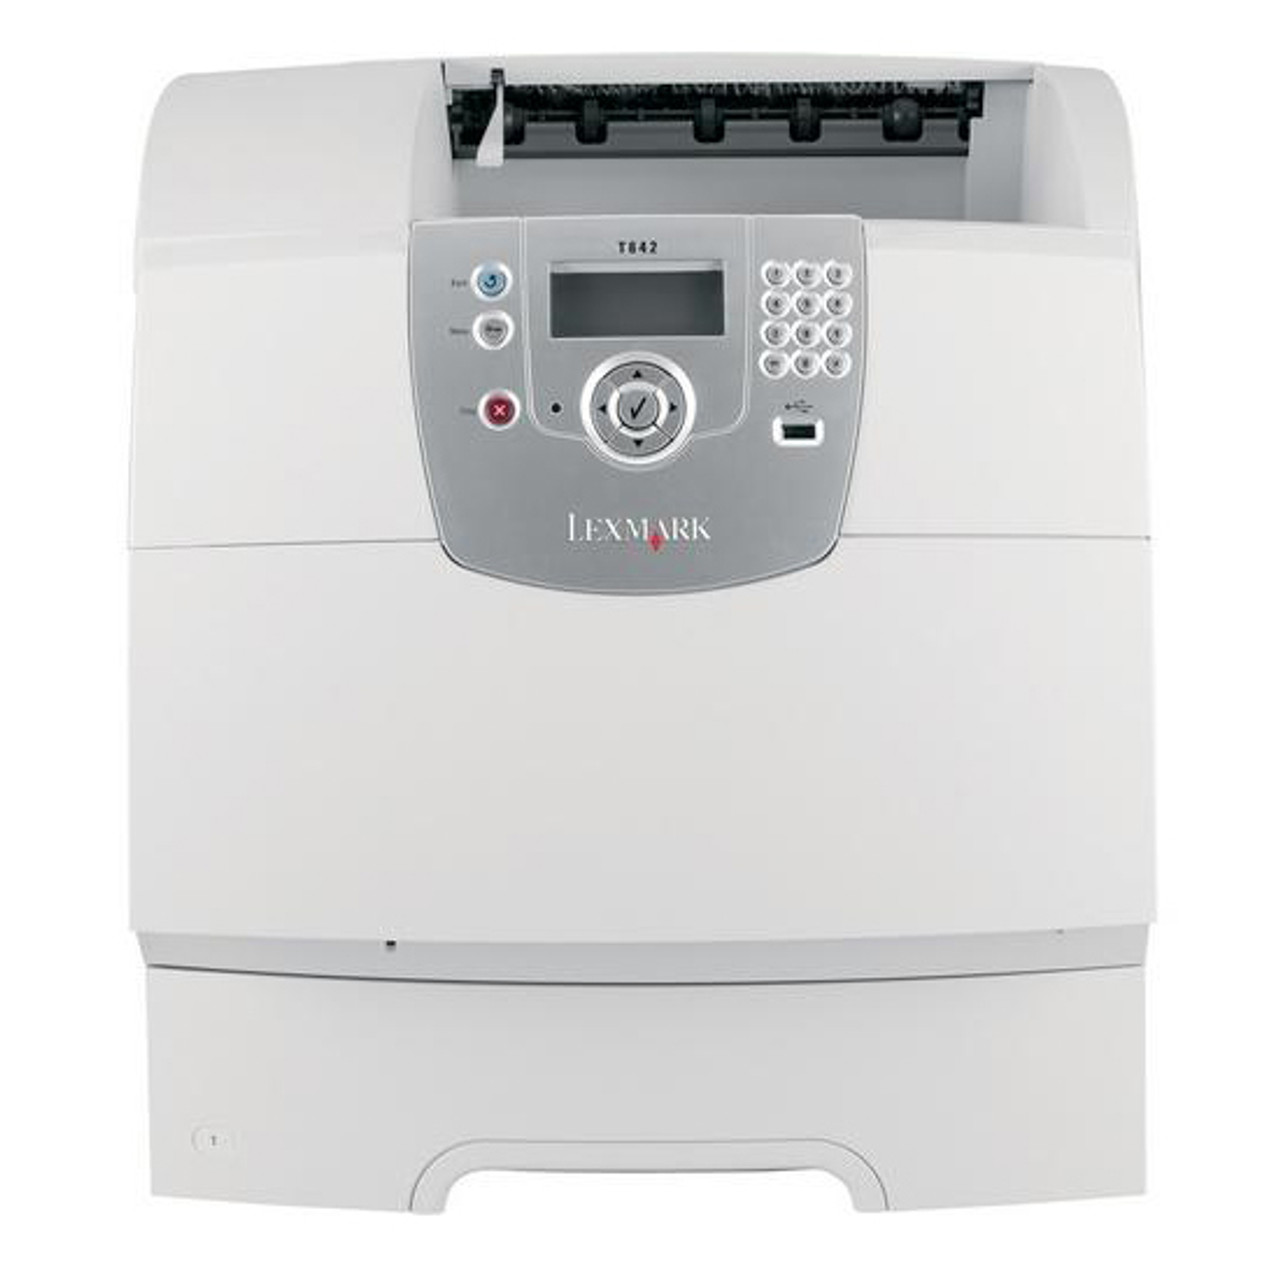 lexmark t642 20g0200 lexmark b w laser printer for sale rh printerstop com Lexmark T652 lexmark t640 user manual